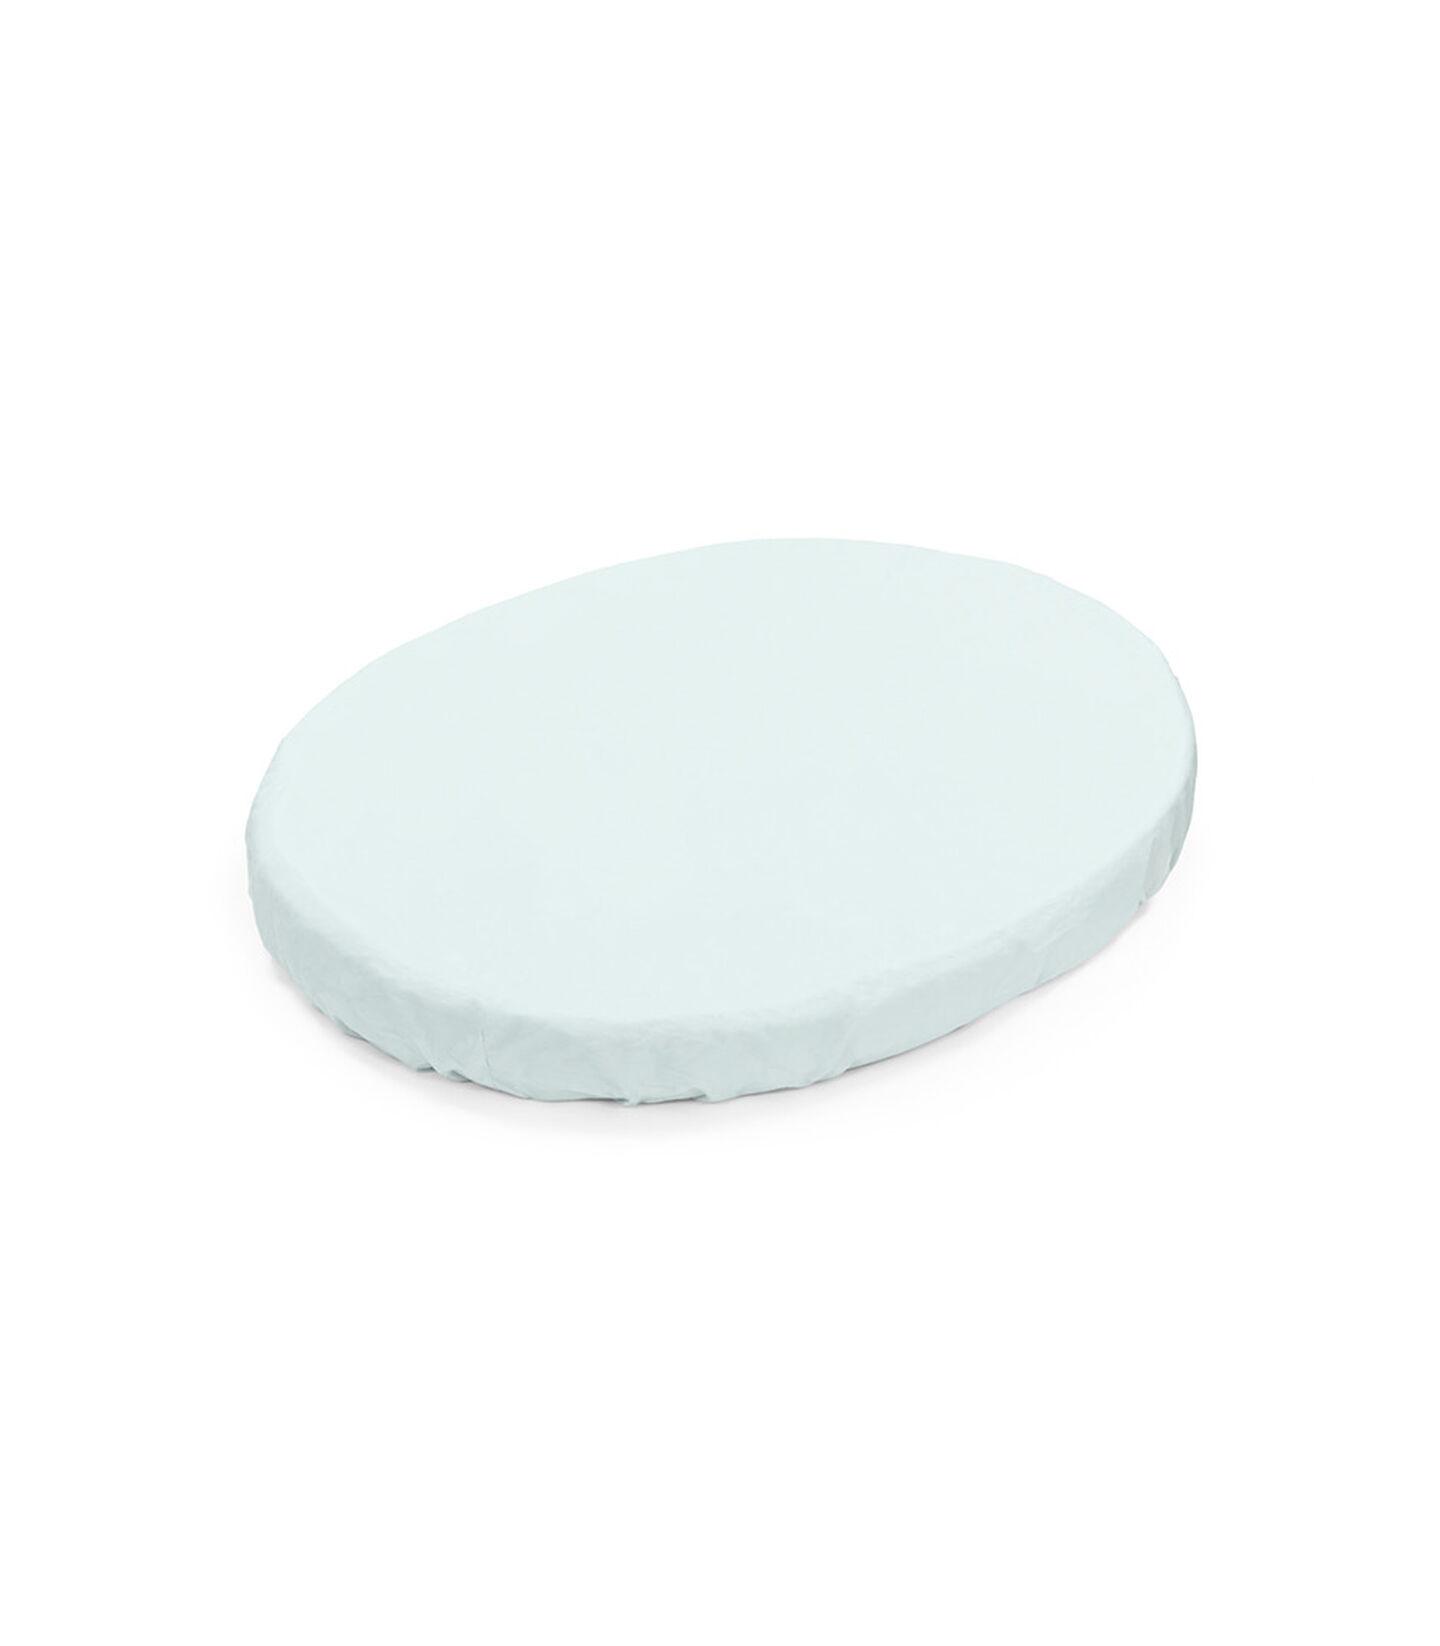 Stokke® Sleepi™ Mini Spannbettlaken Powder Blue, Powder Blue, mainview